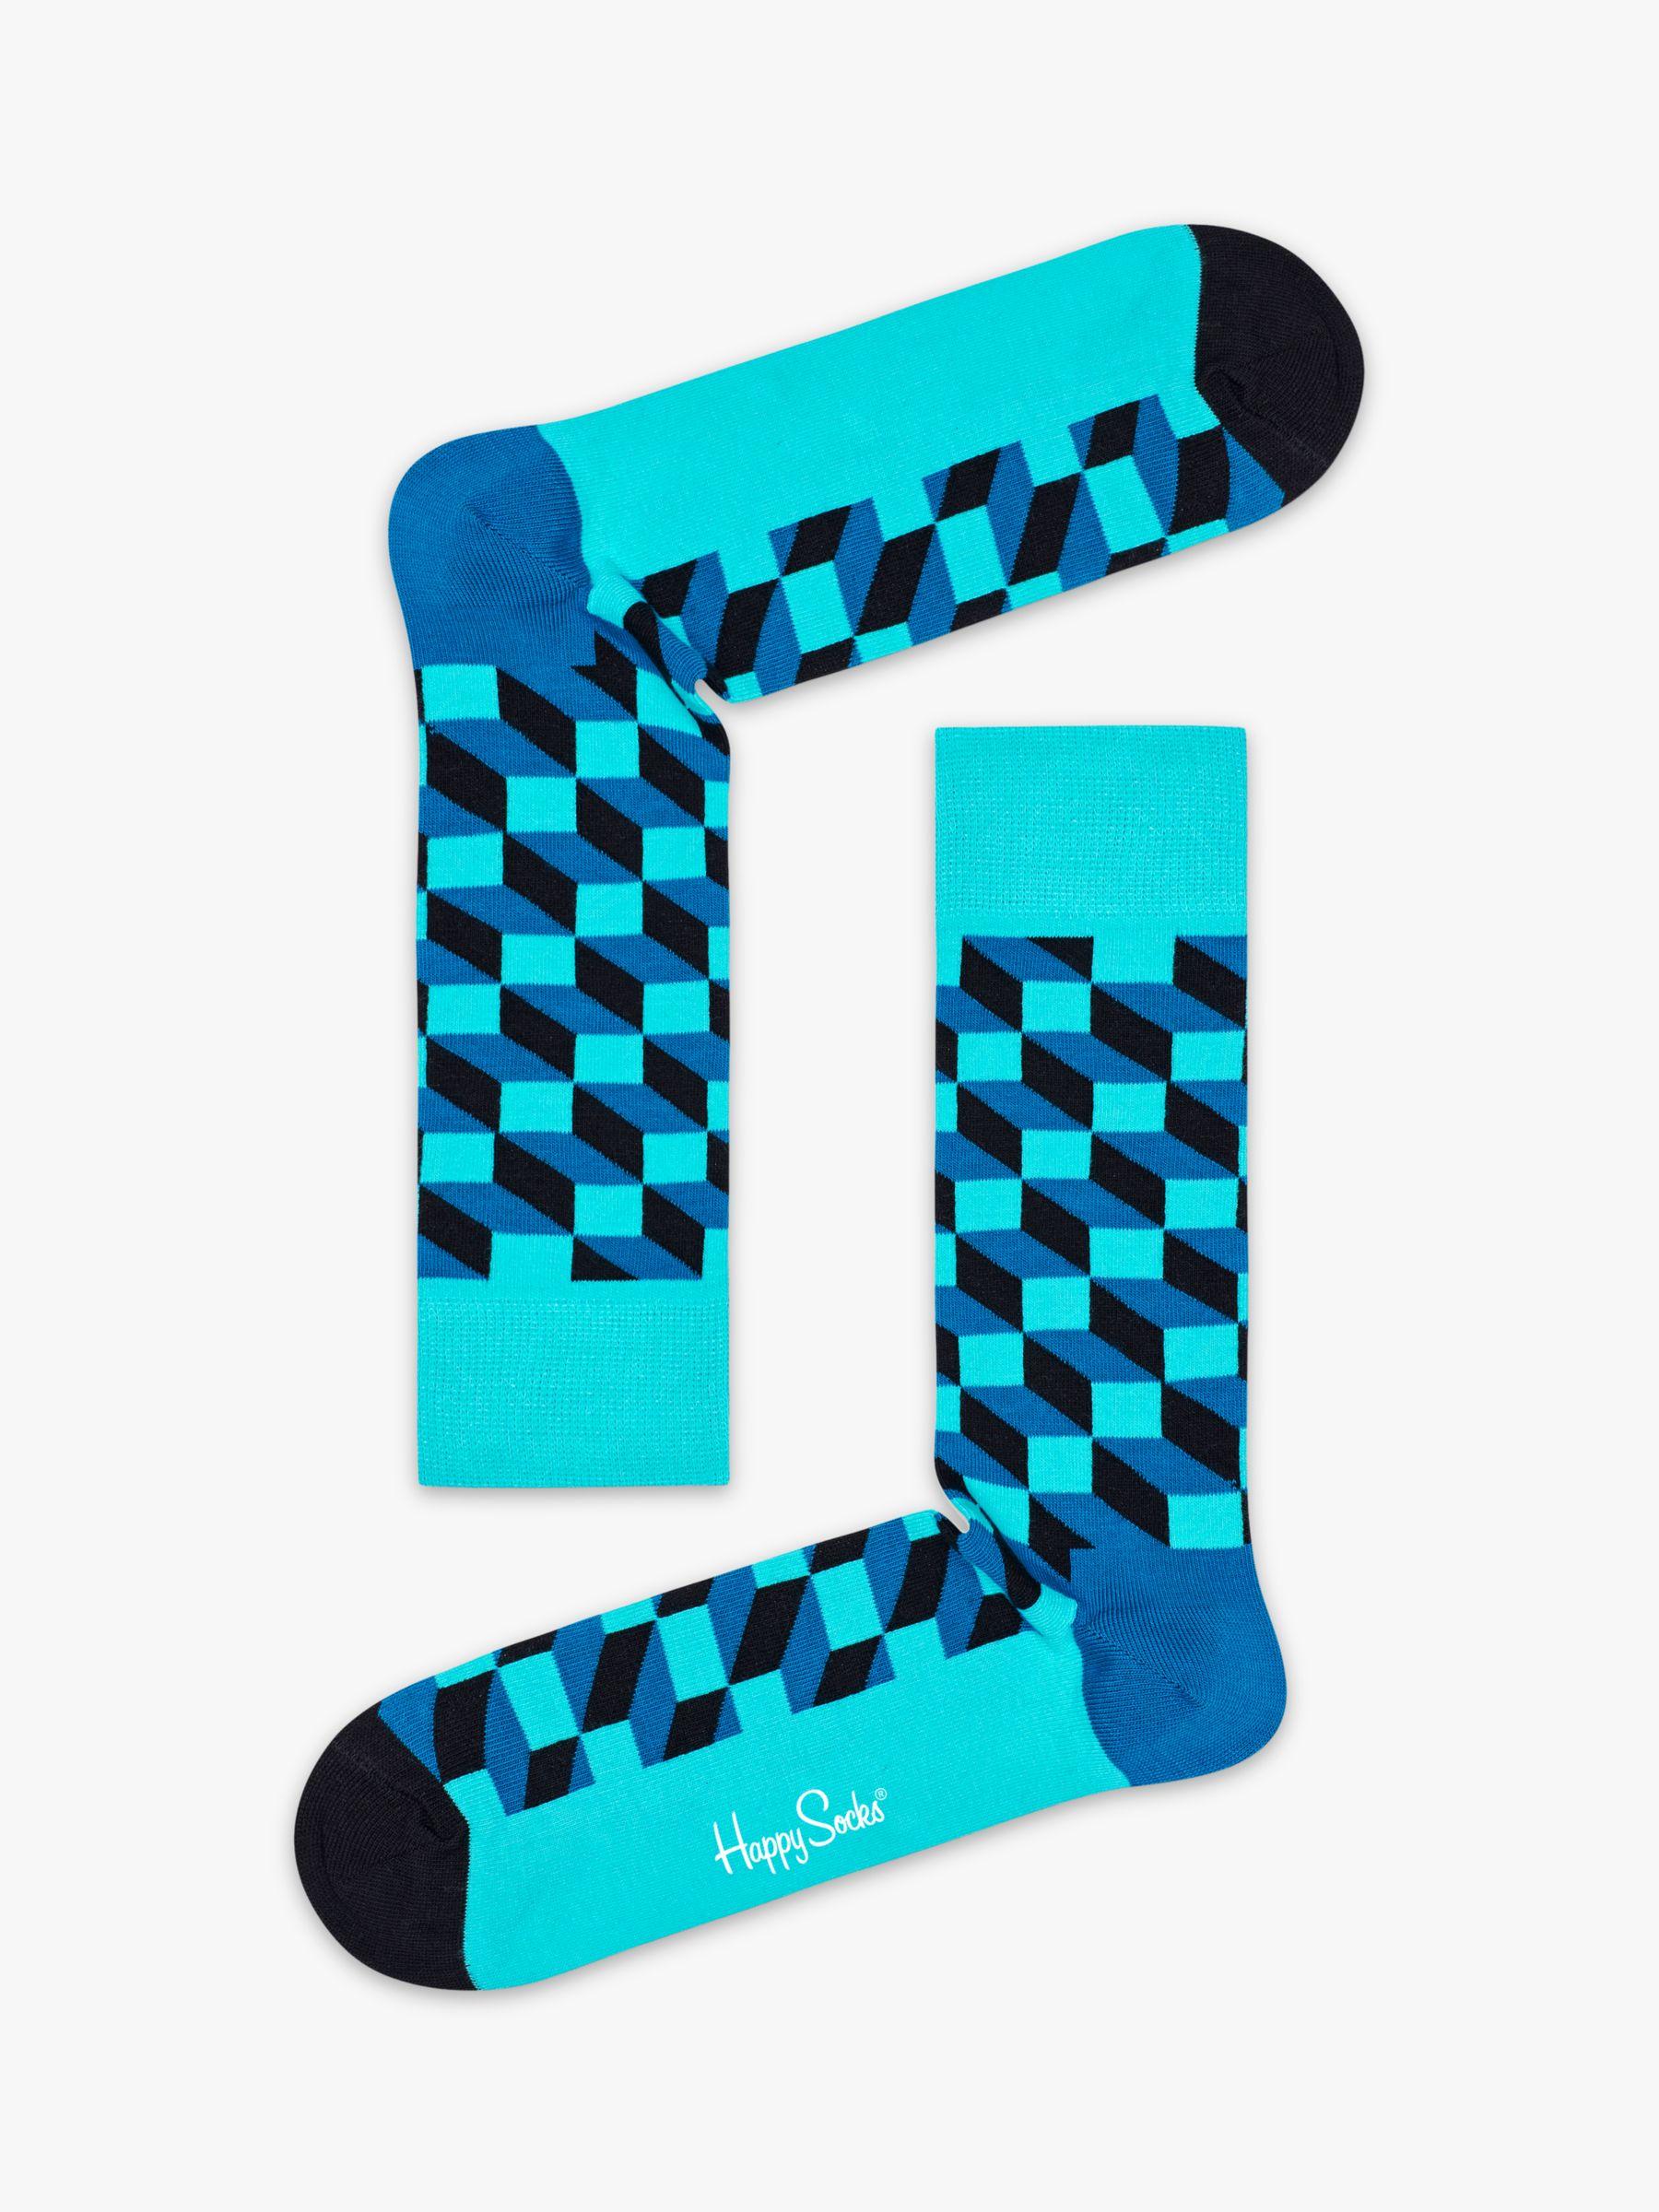 Happy Socks Happy Socks Filled Optic Socks, One Size, Blue